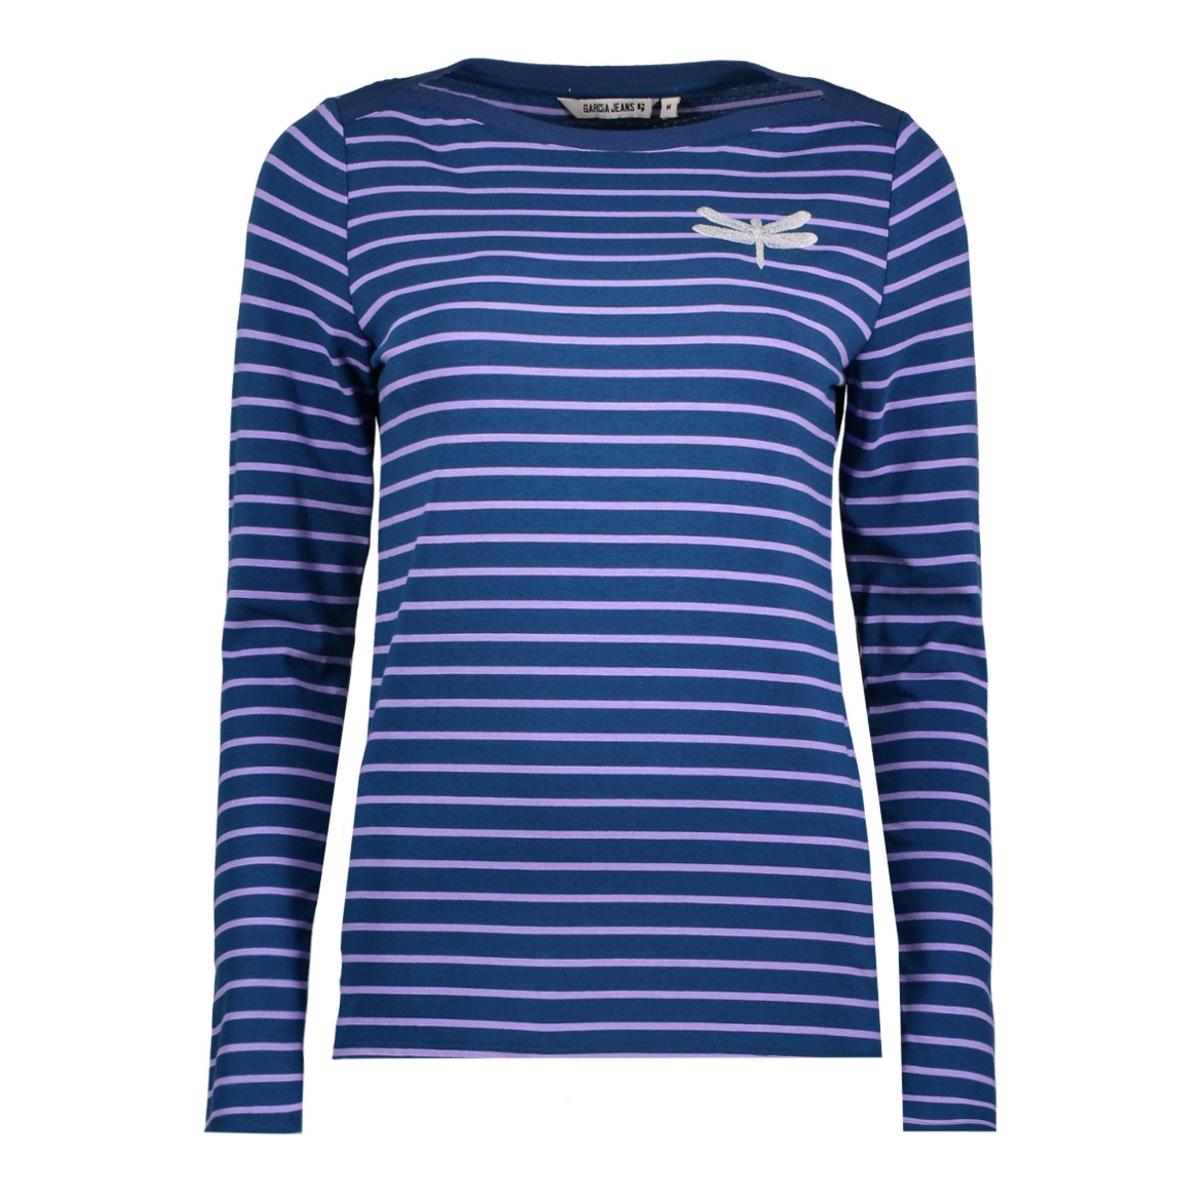 x80009 garcia t-shirt 2812 blue opal